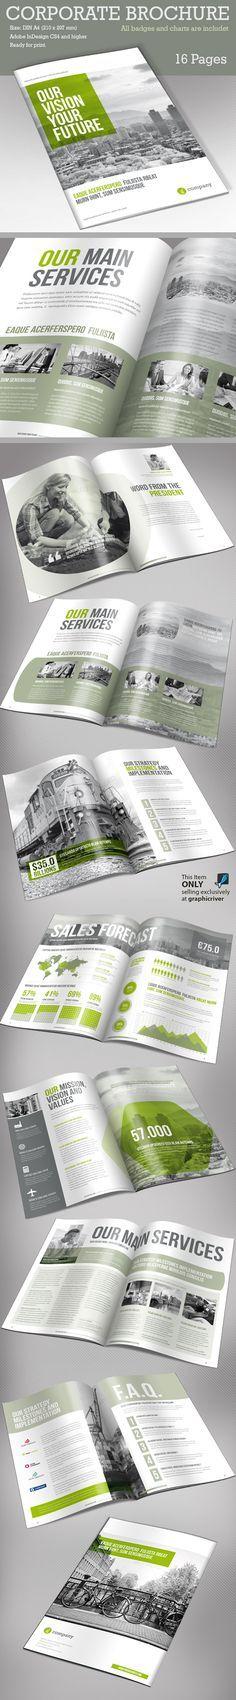 Business Brochure Templates – 18 Designs